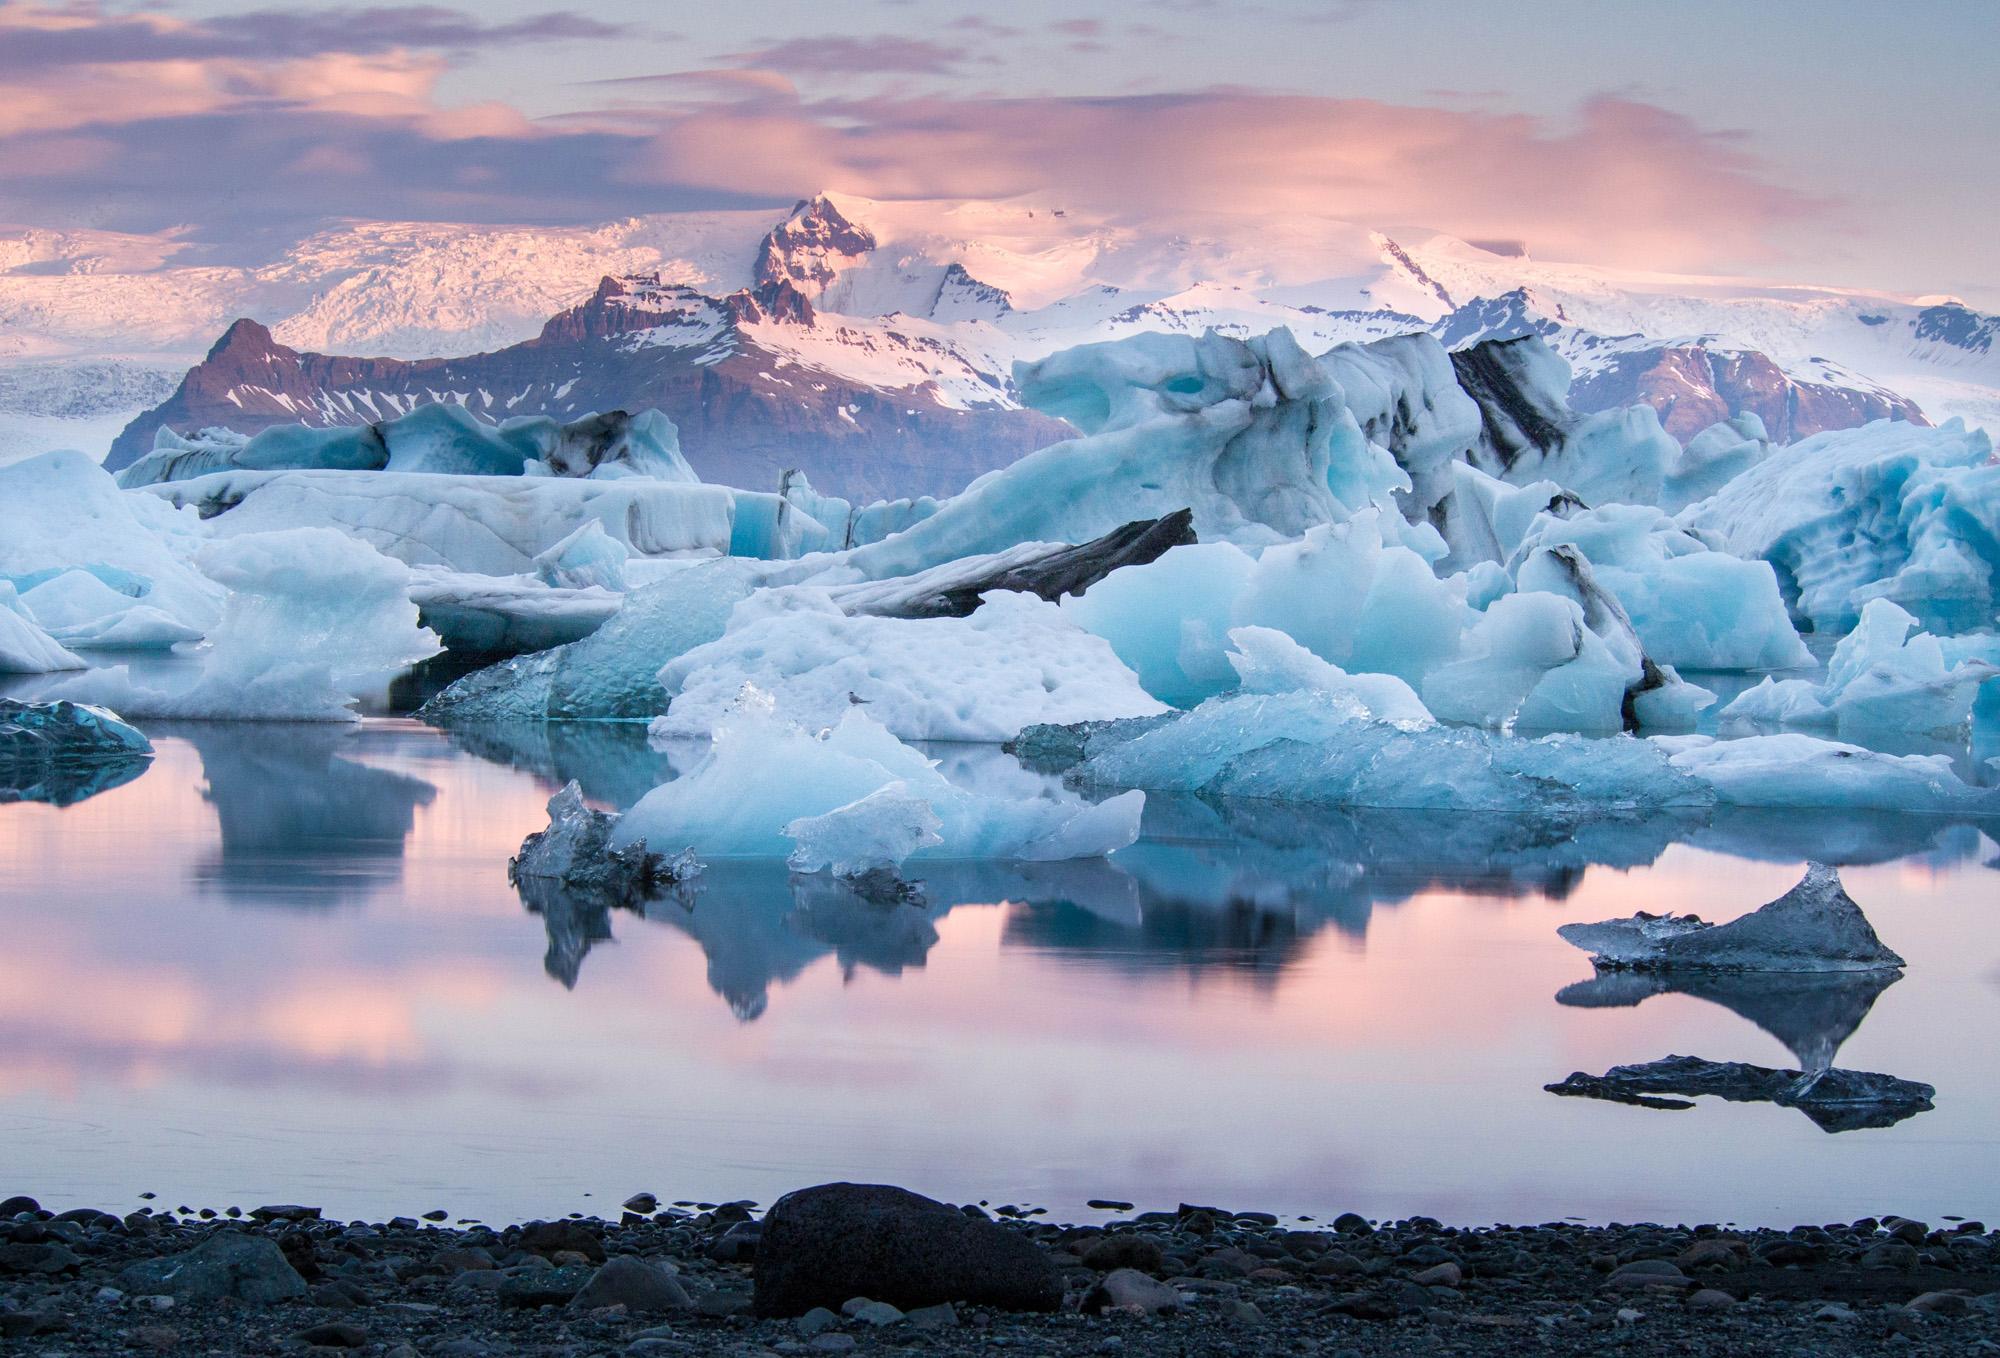 The Jökulsárlón Glacier lagoon under a pink hued sky.